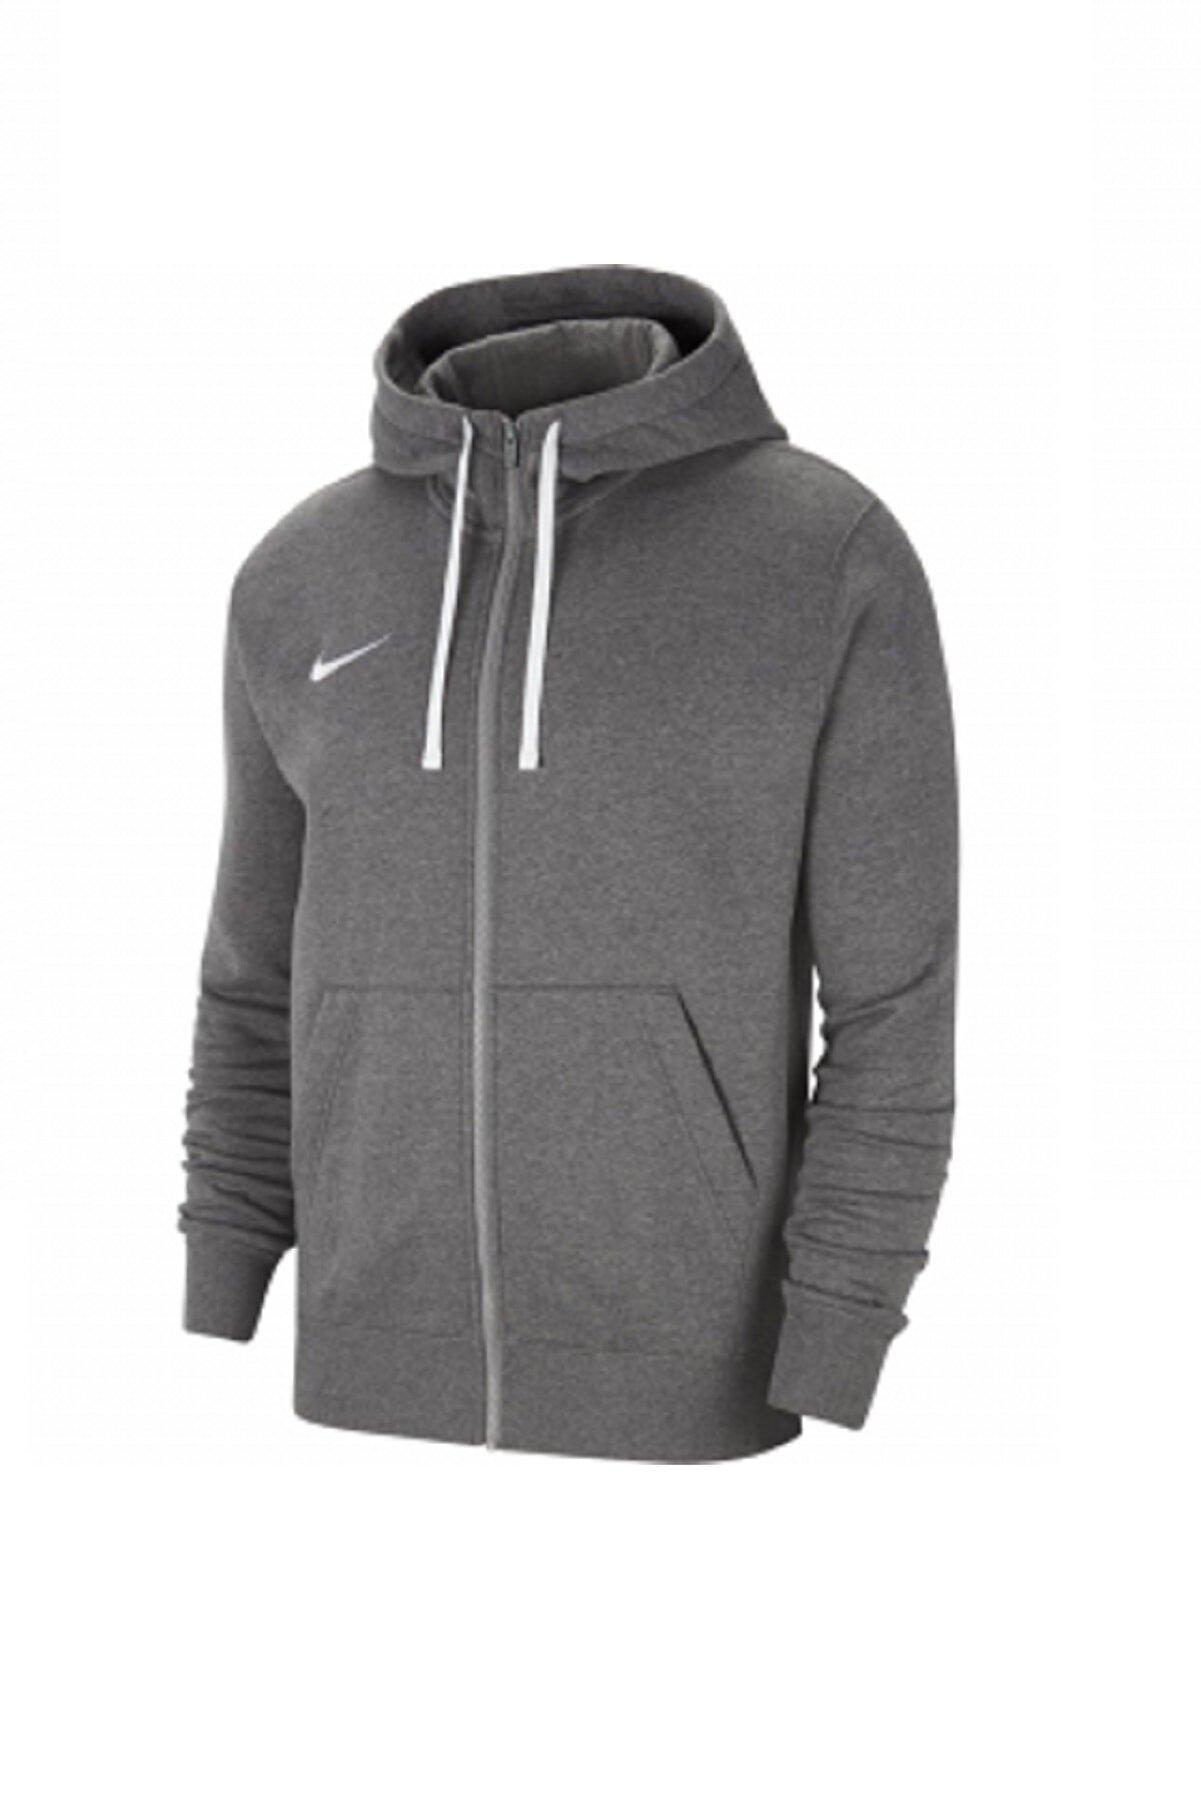 Nike Kadın Spor Sweatshirt - Dry Park 20 - CW6955-071